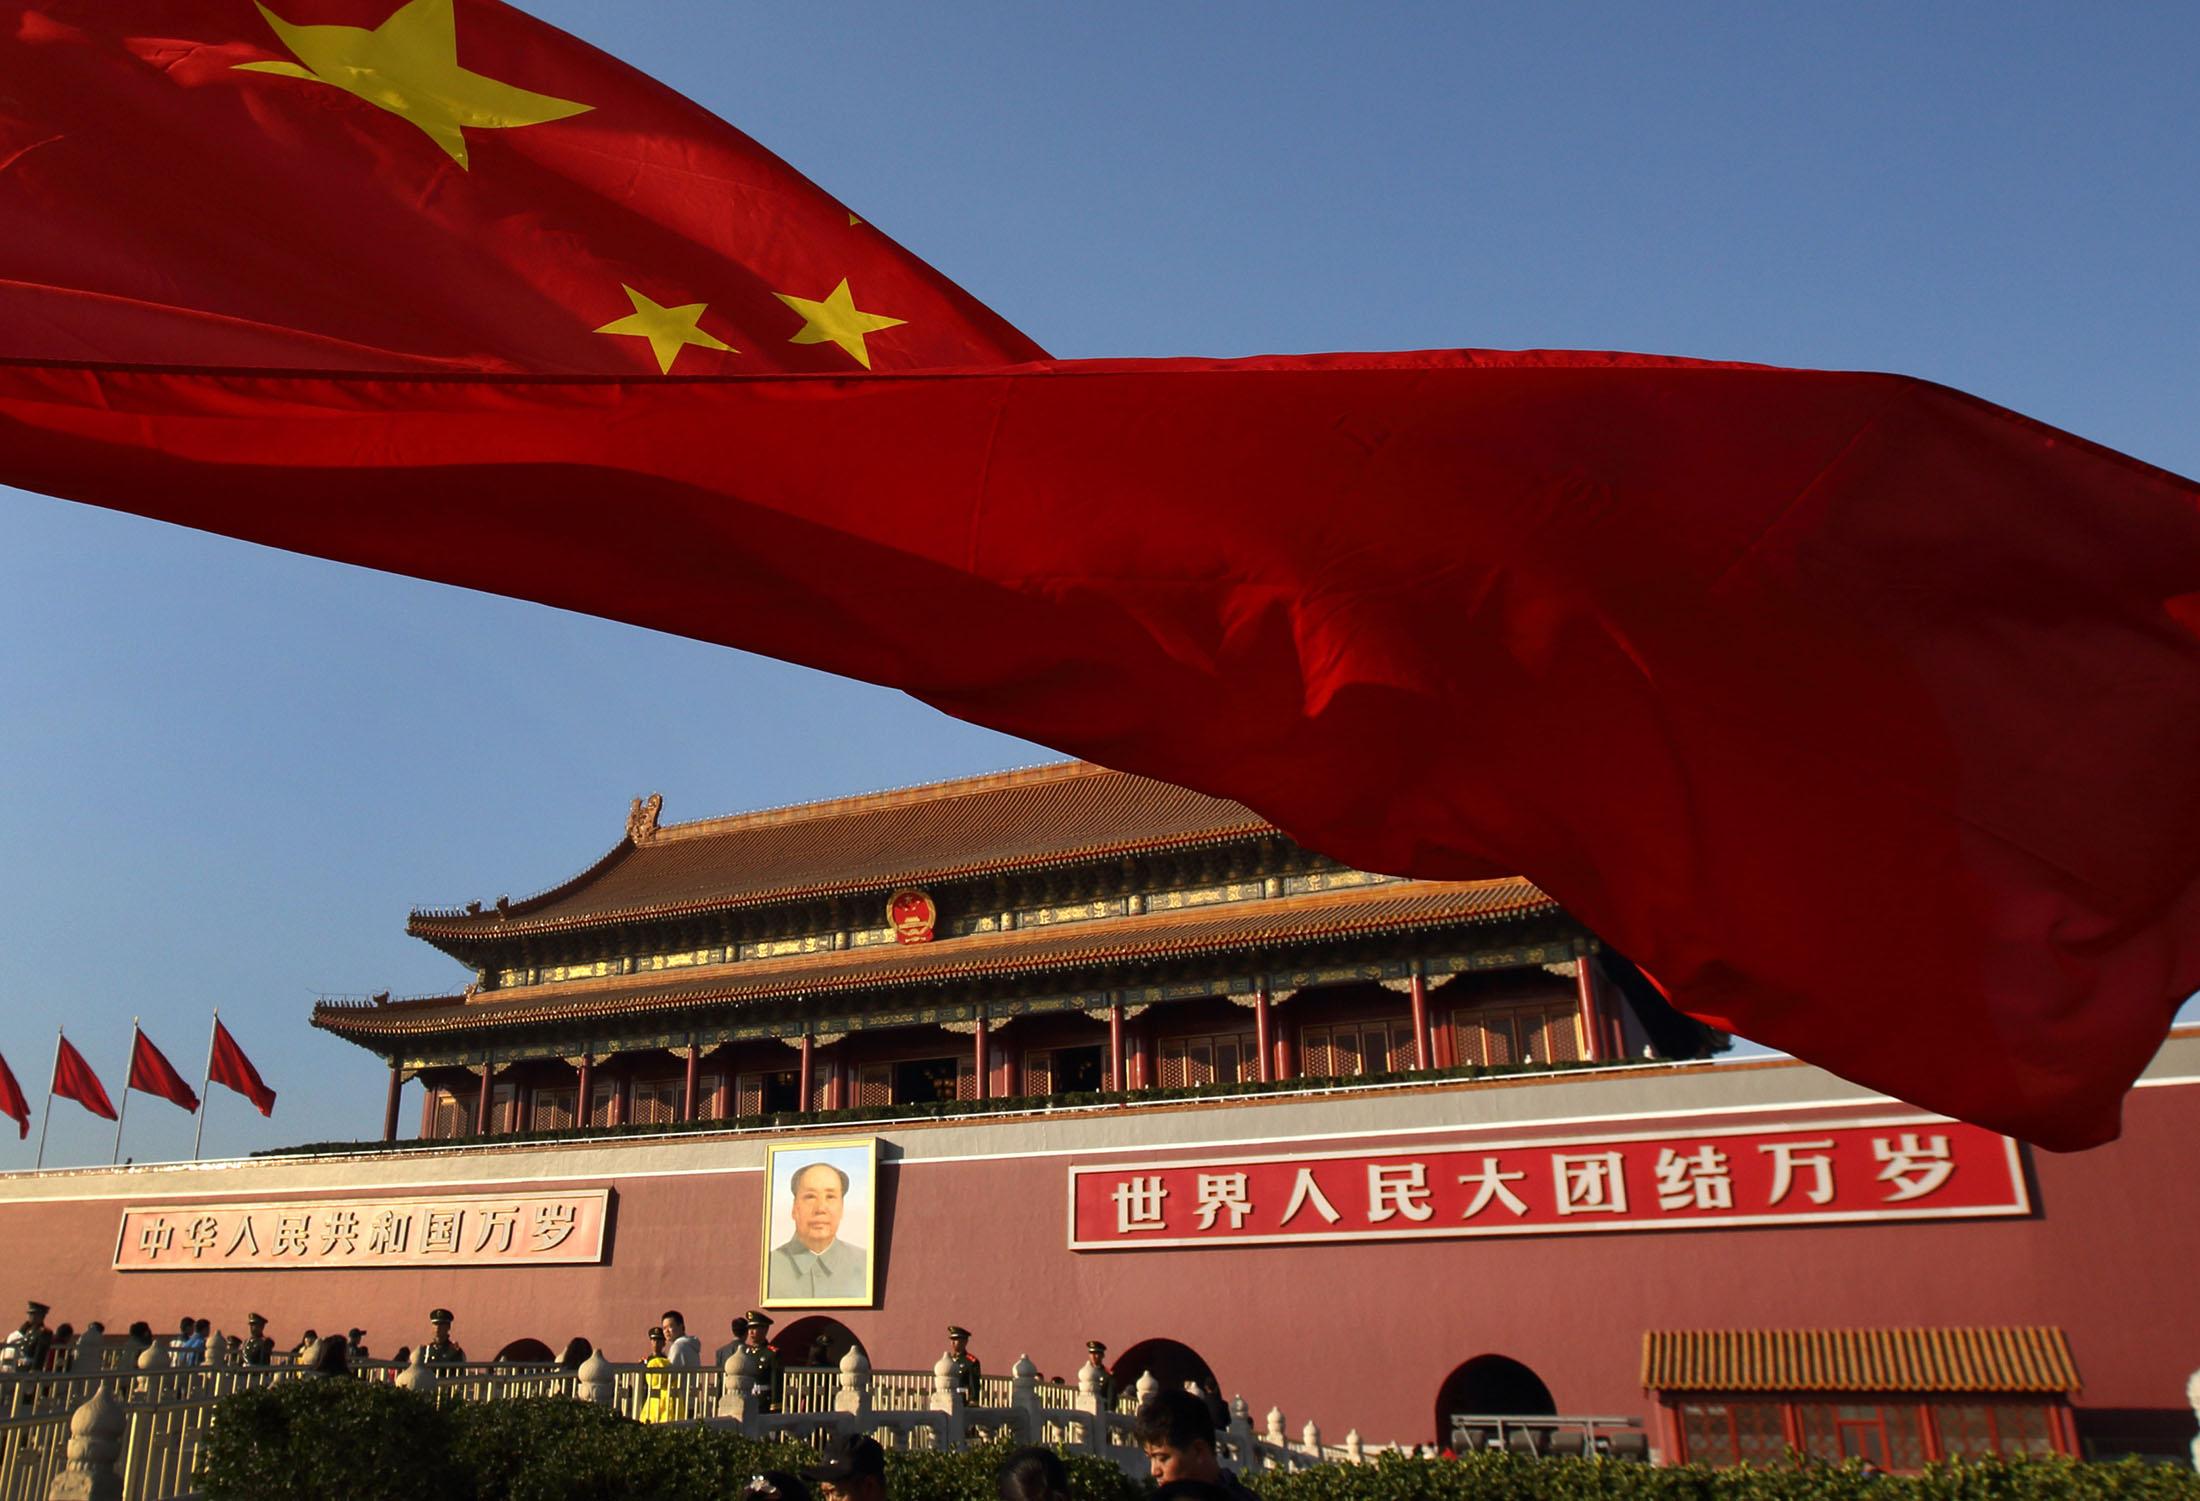 China Slams Western Democracy as Flawed